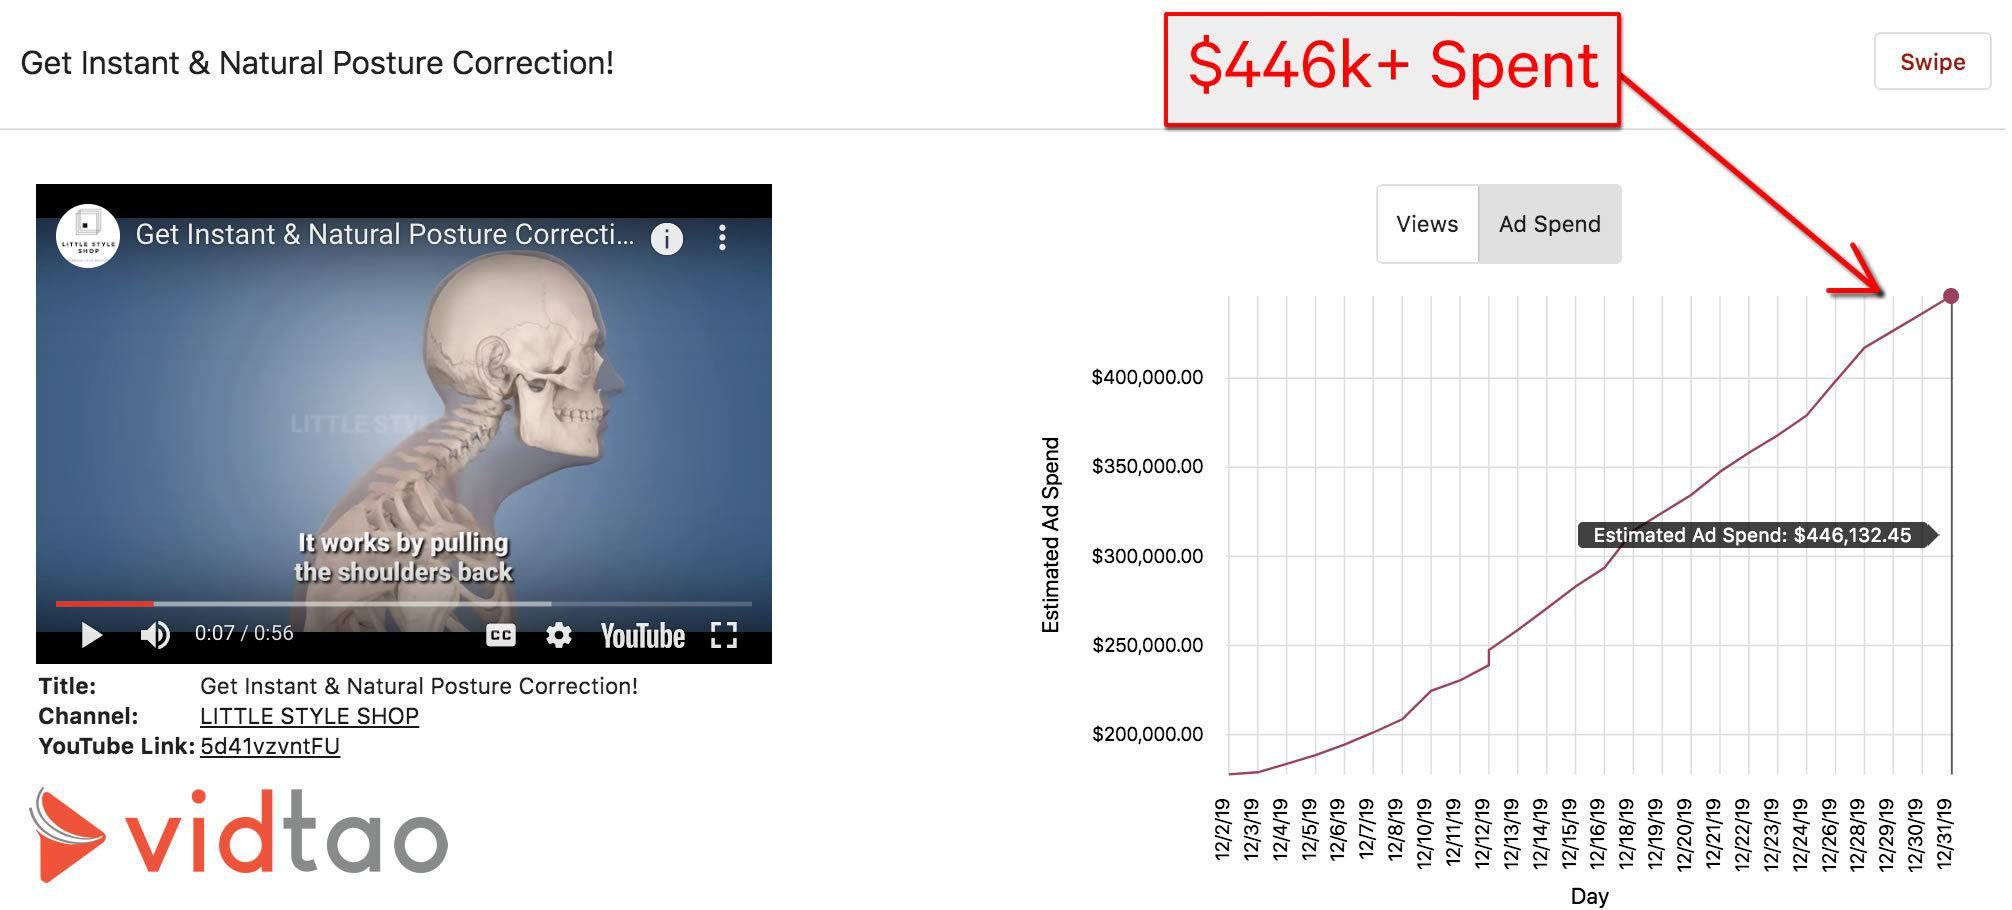 youtube-ad-spy-tool-screenshot-slouch-tool-screenshot-20200101-1